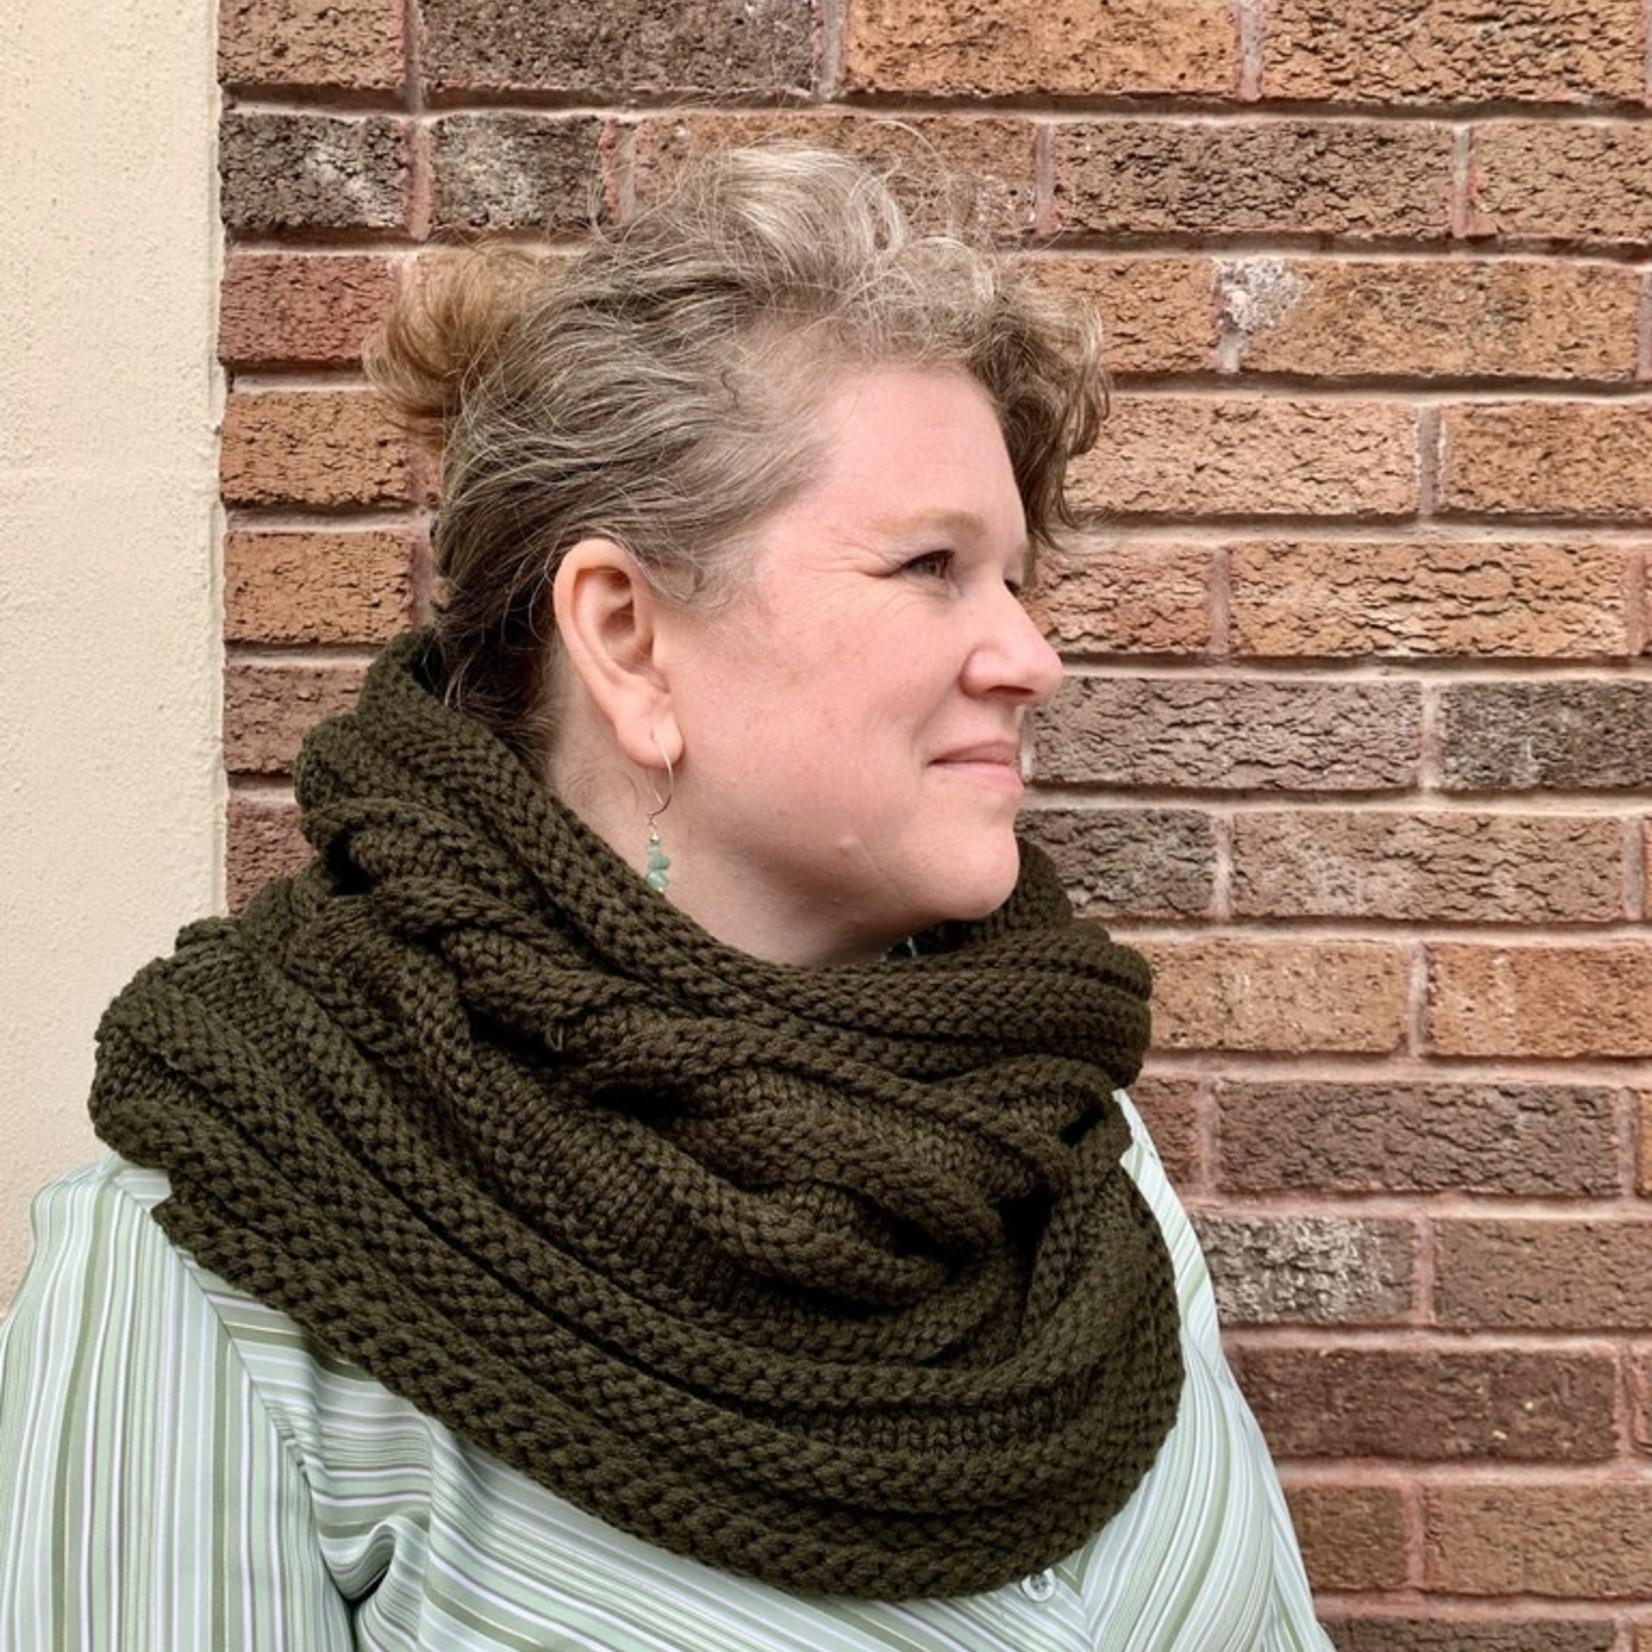 Chunky Rib Knit Infinity Scarves